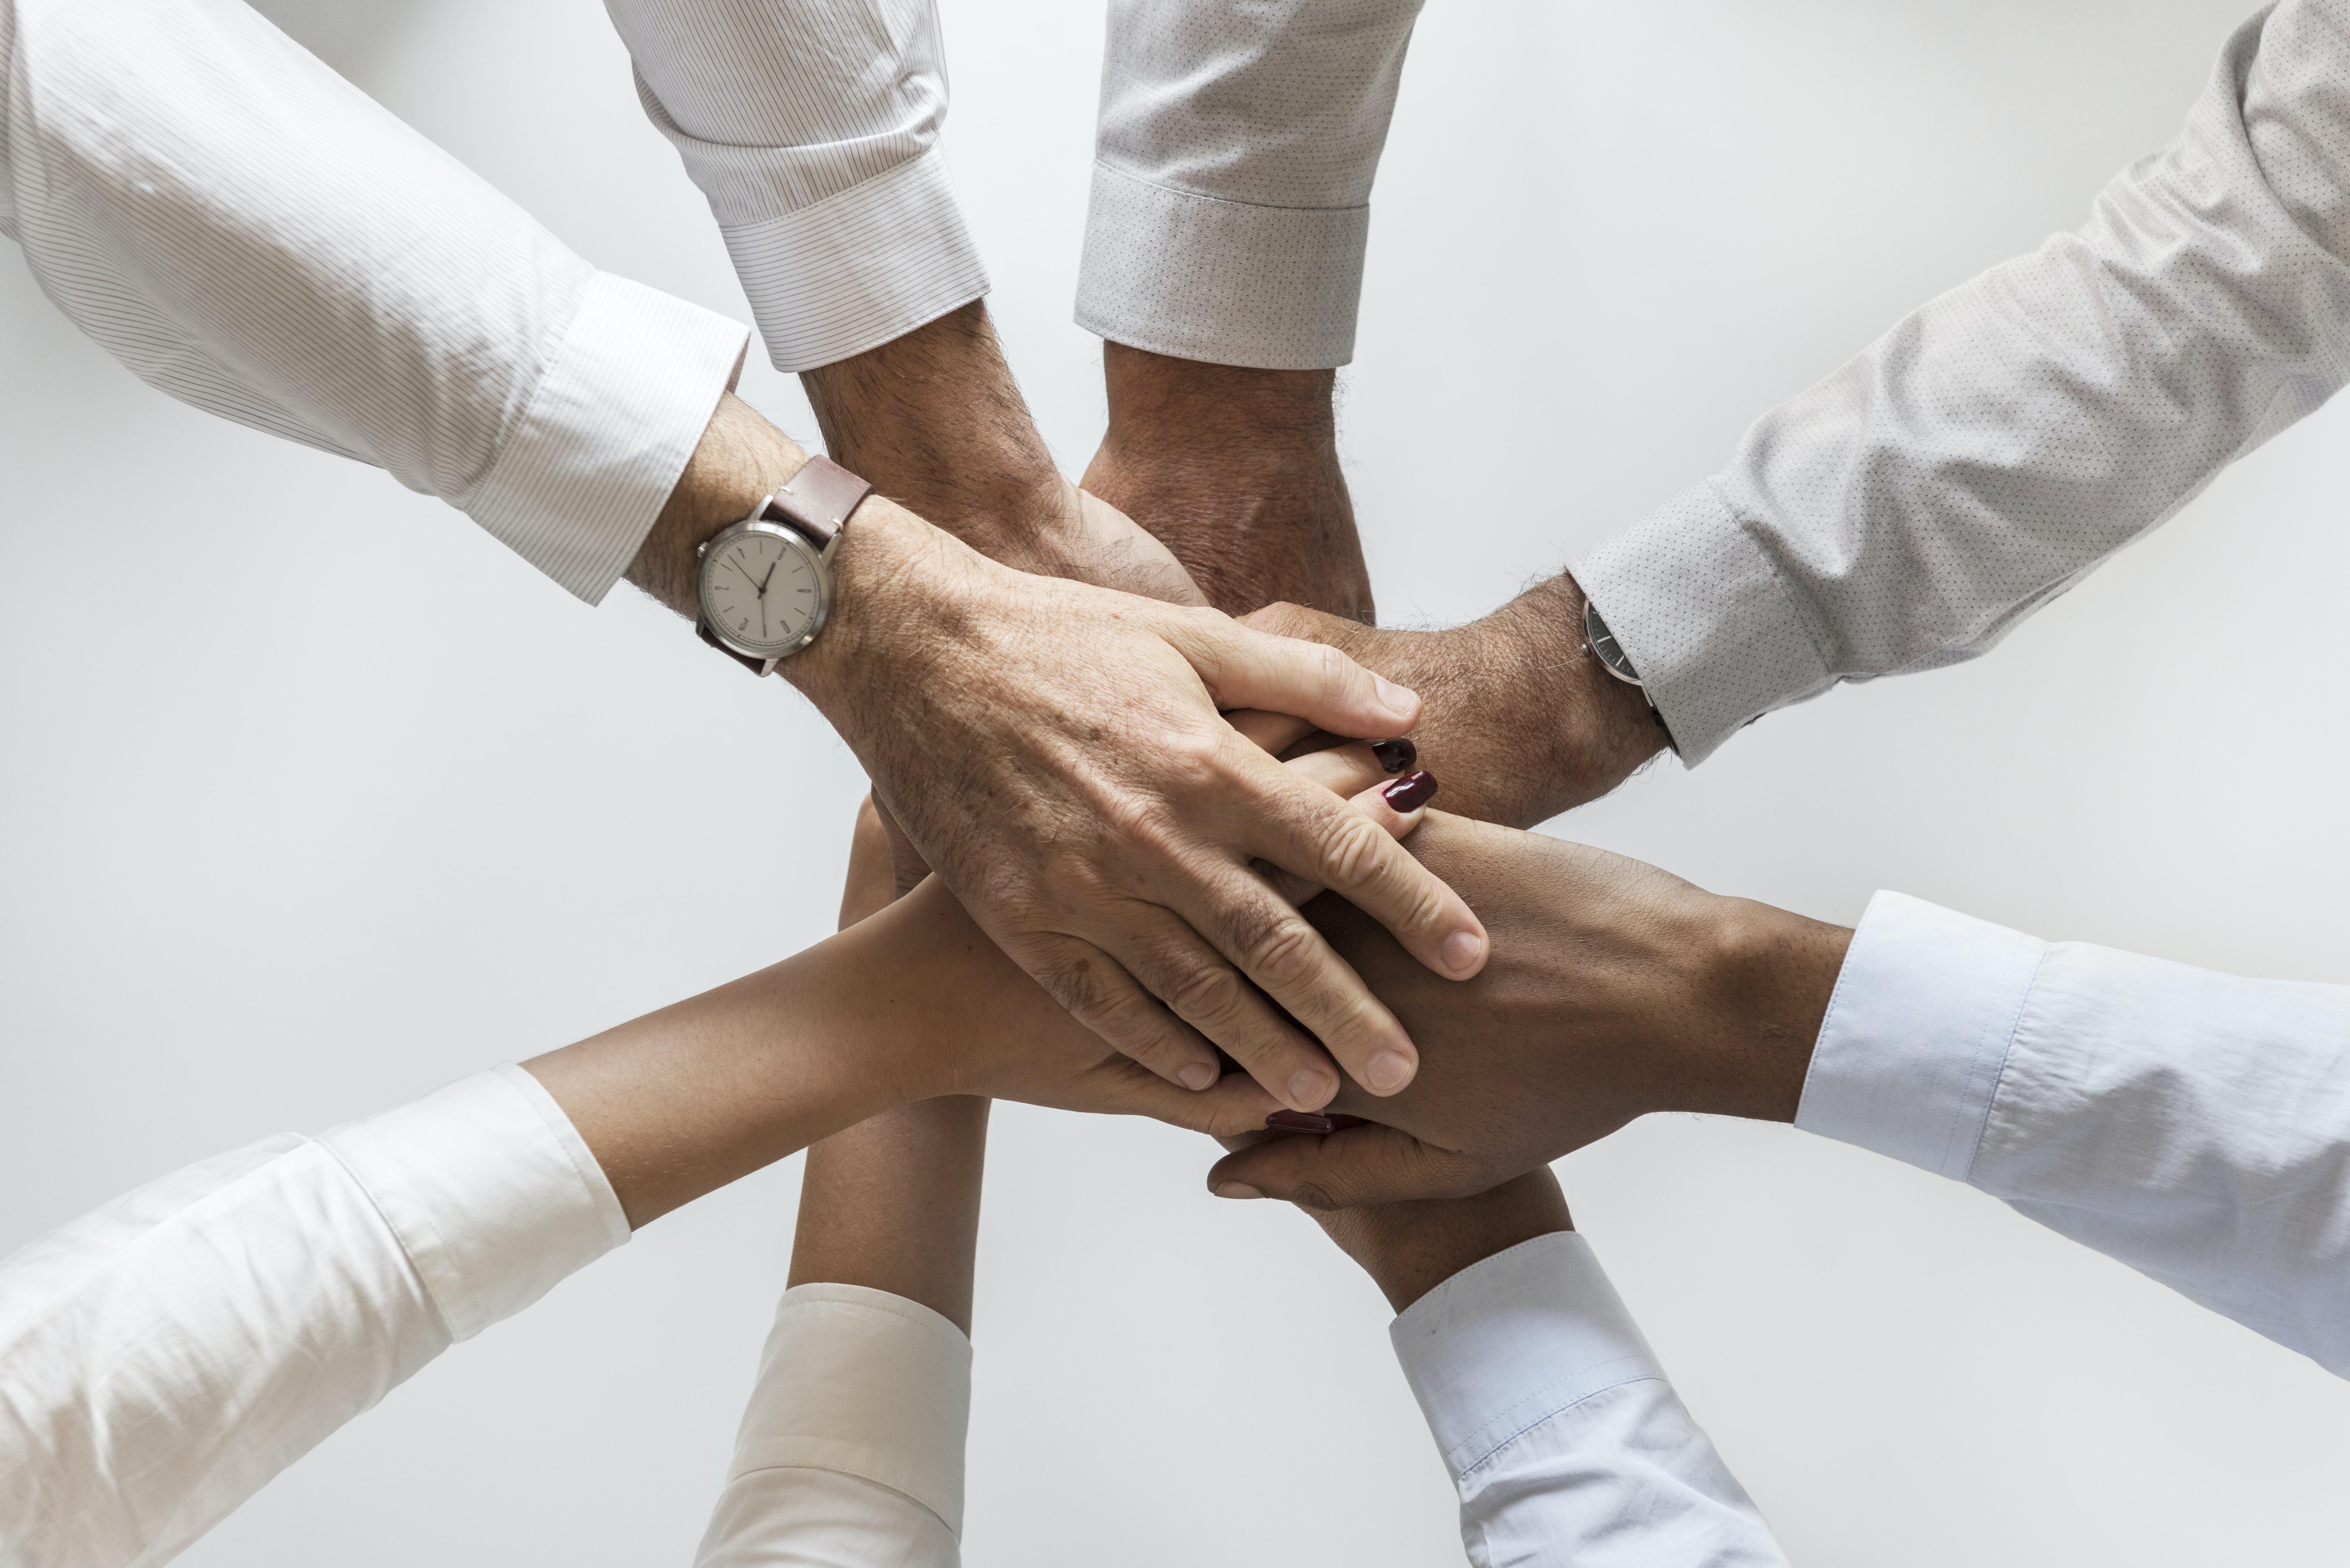 communication and Teamwork